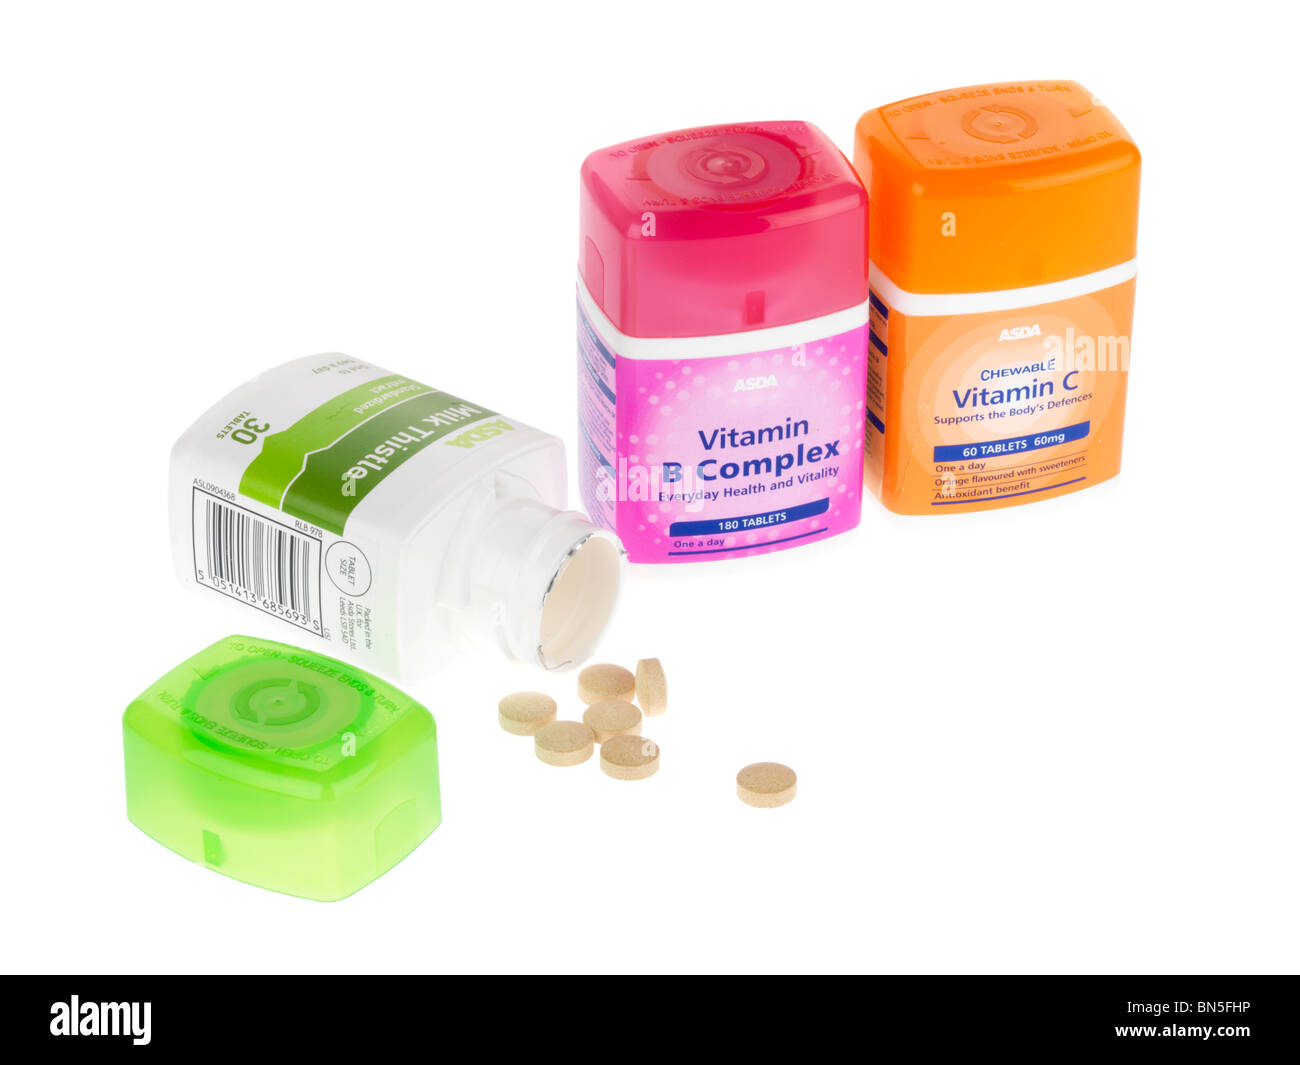 Vitamins - Stock Image